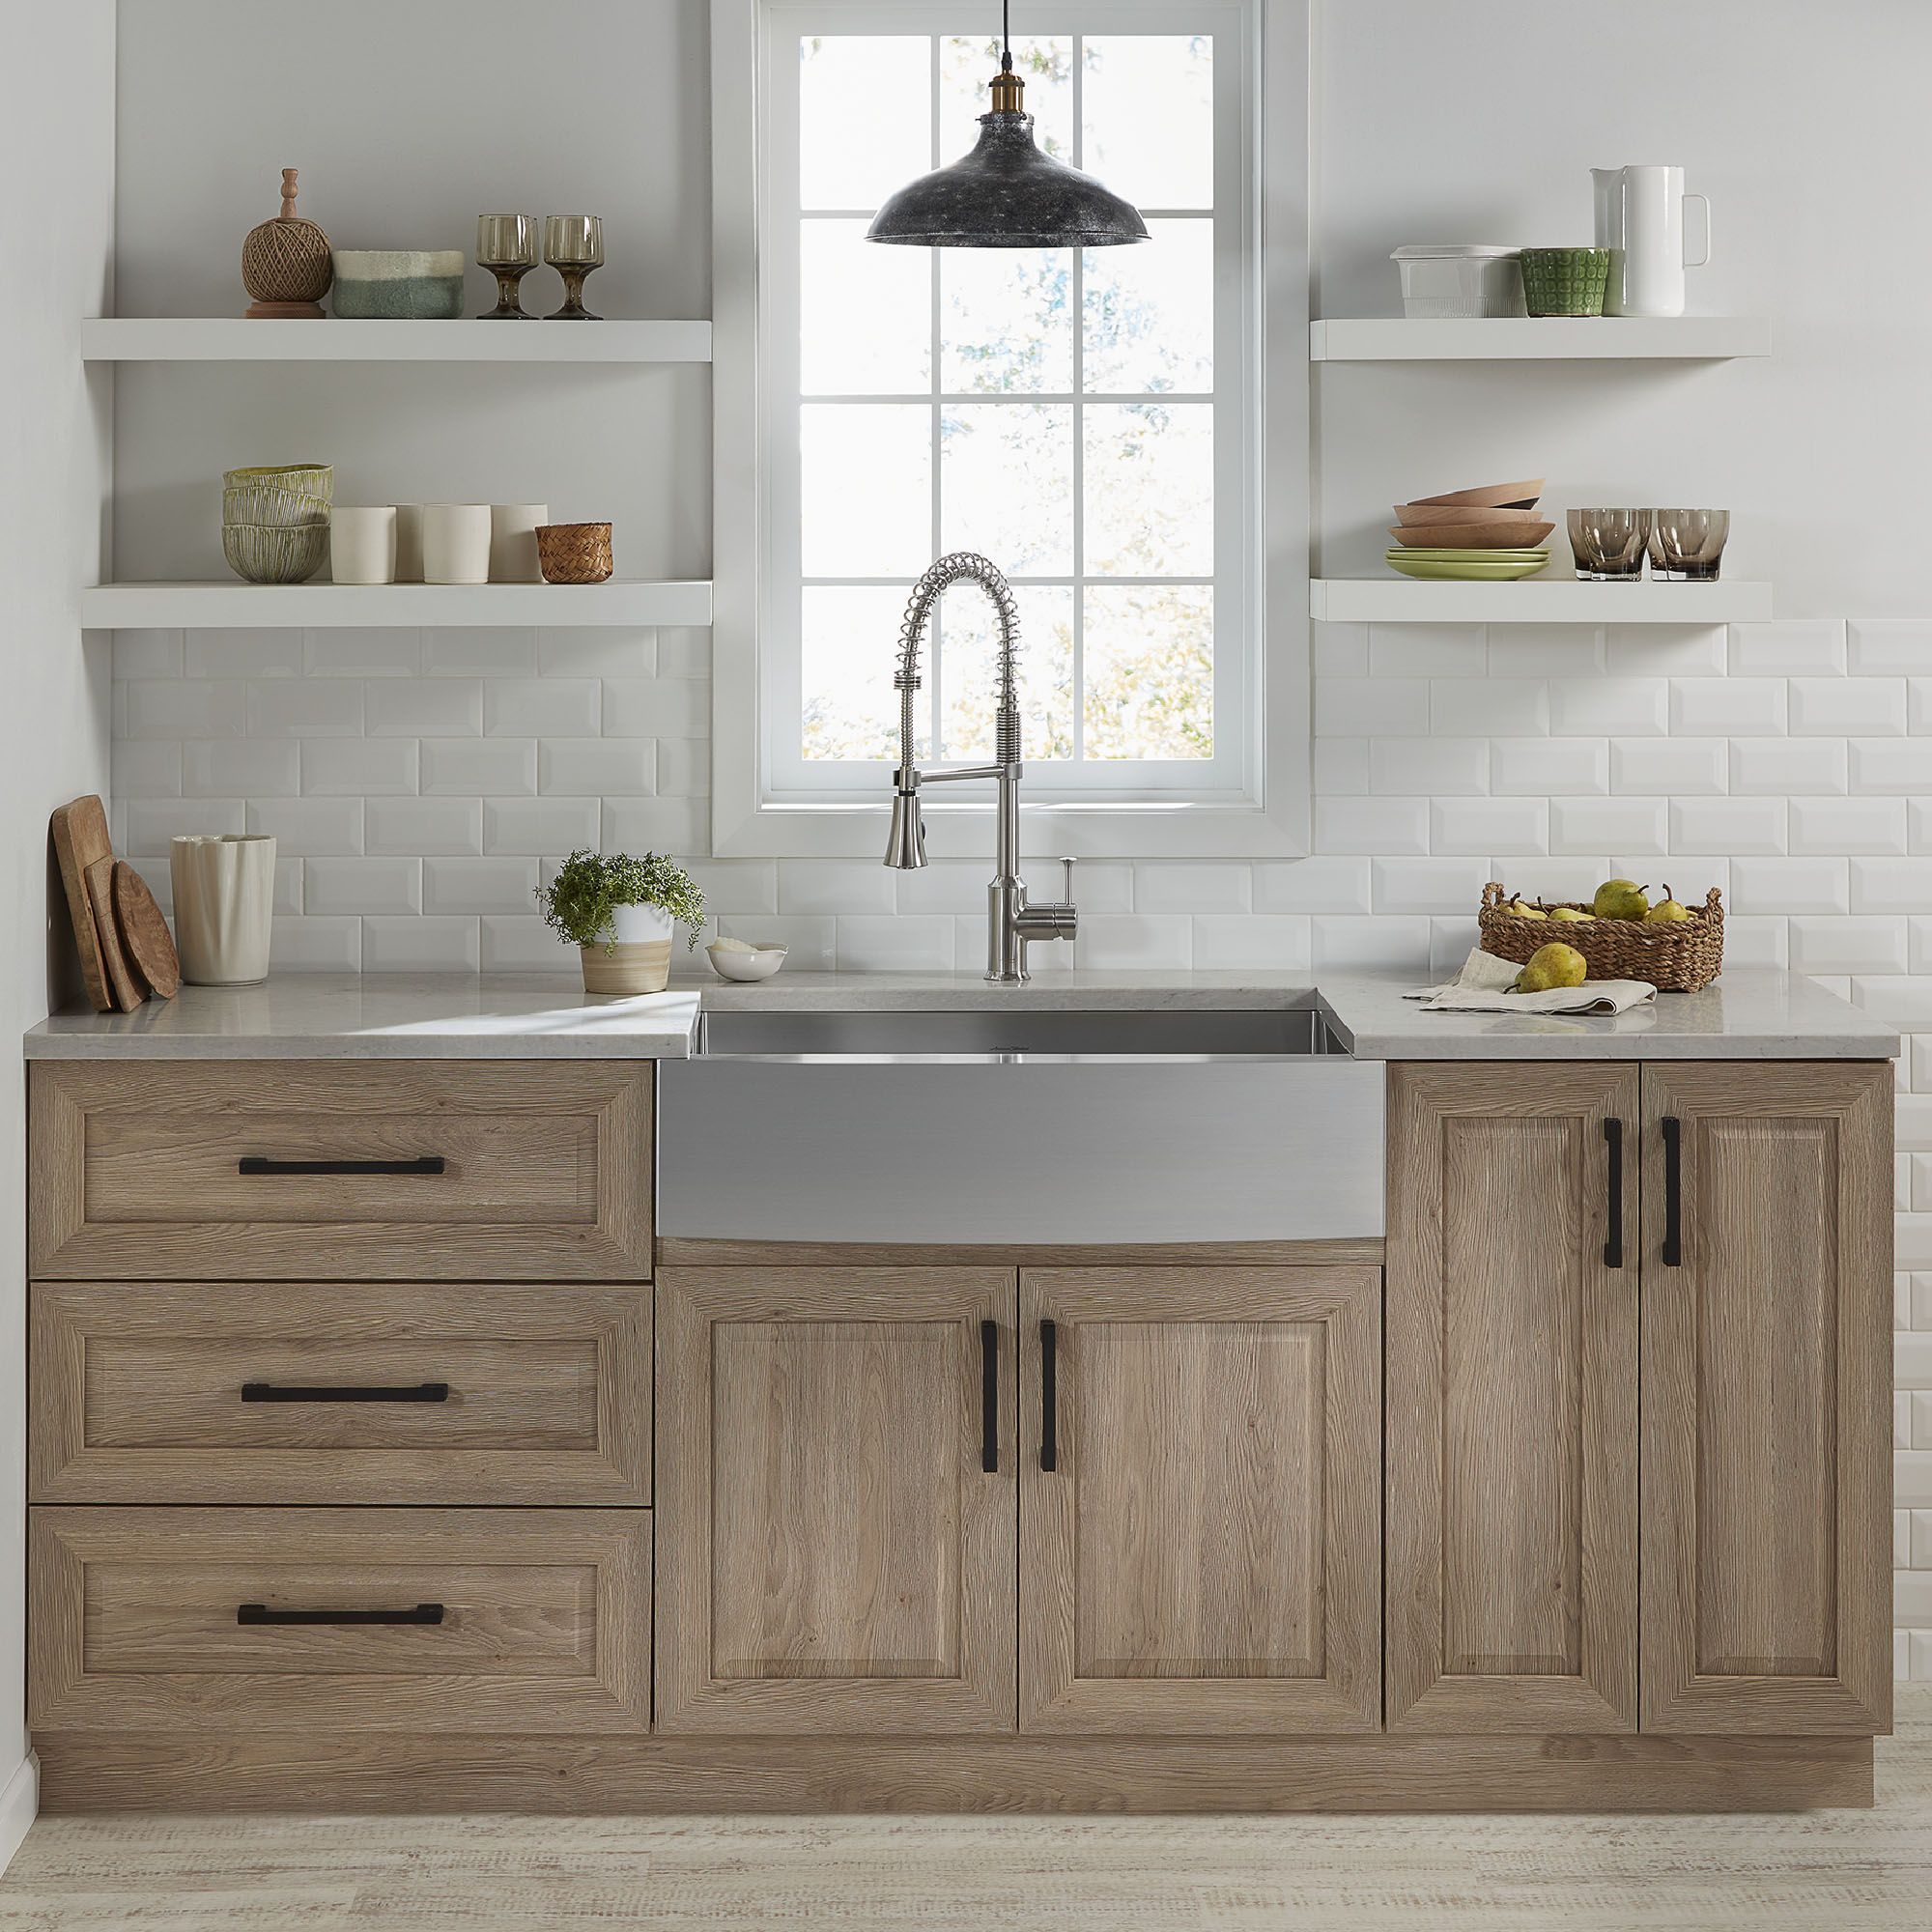 Pekoe 33x22 Inch Stainless Steel Farmhouse Sink American Standard Stained Kitchen Cabinets Kitchen Cabinet Inspiration Kitchen Design